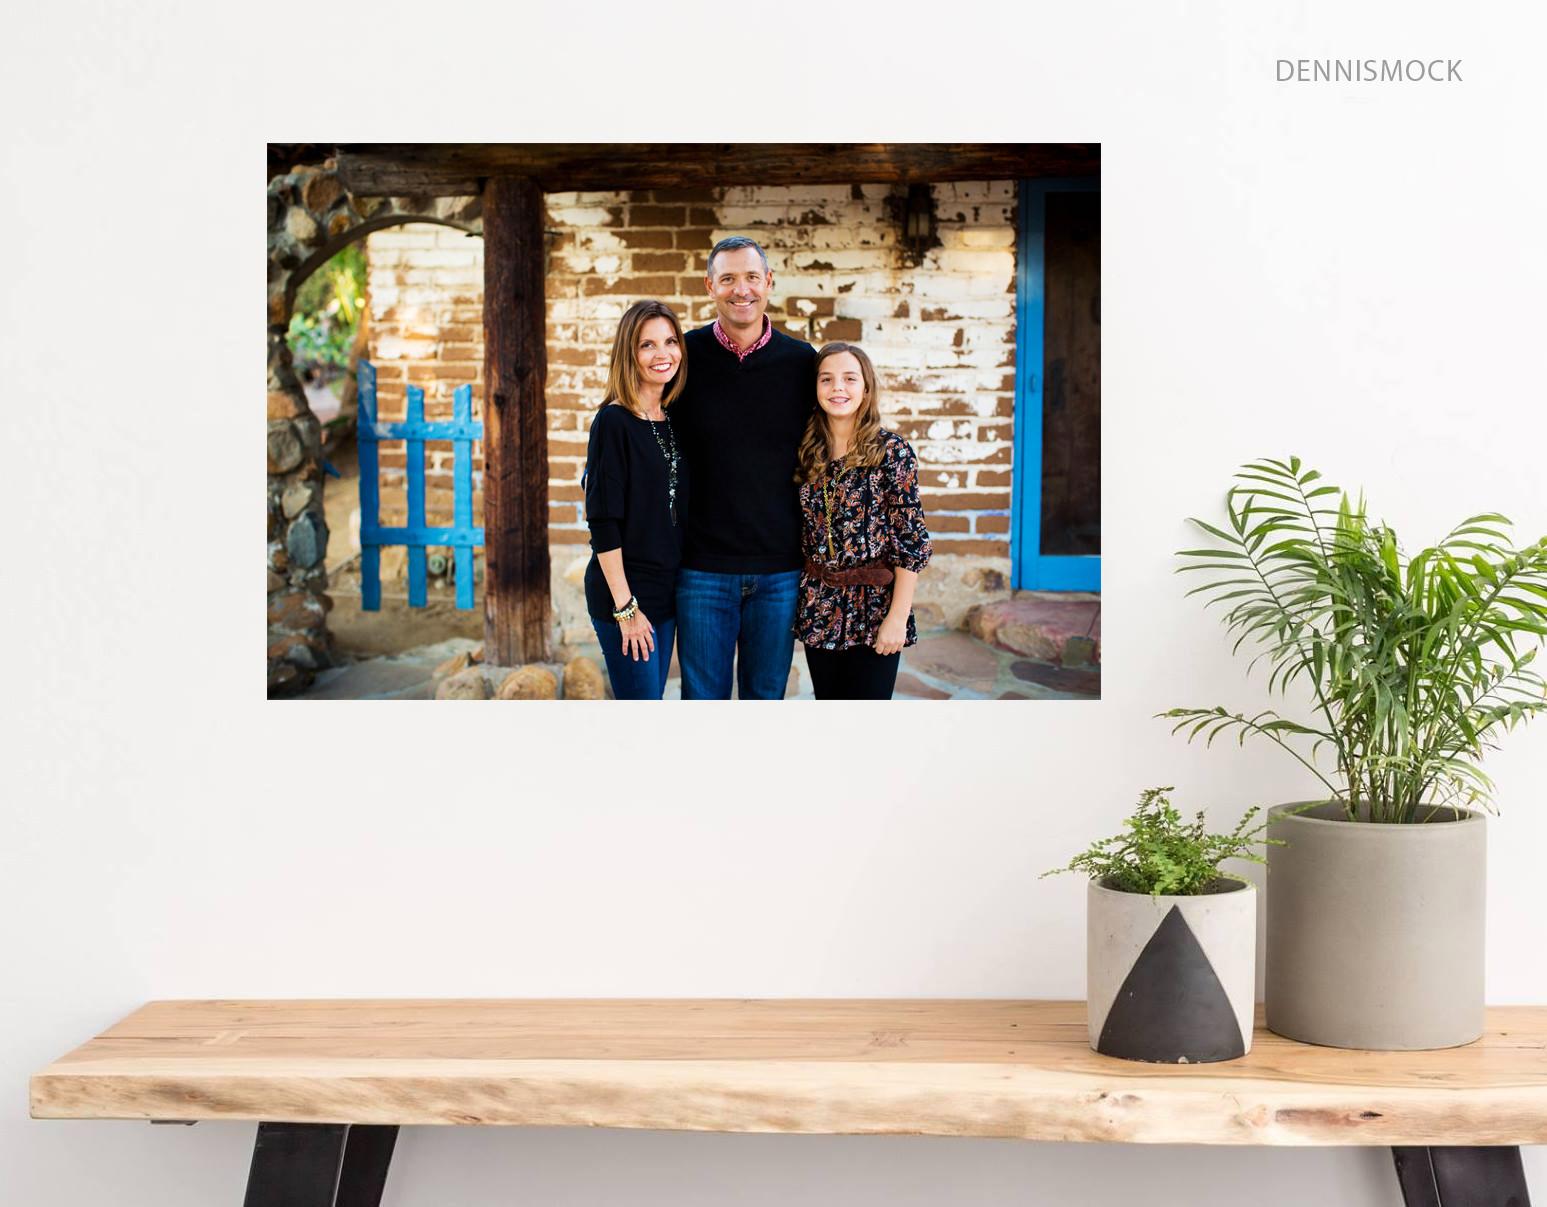 San Diego family portrait in a rustic setting in Carlsbad California